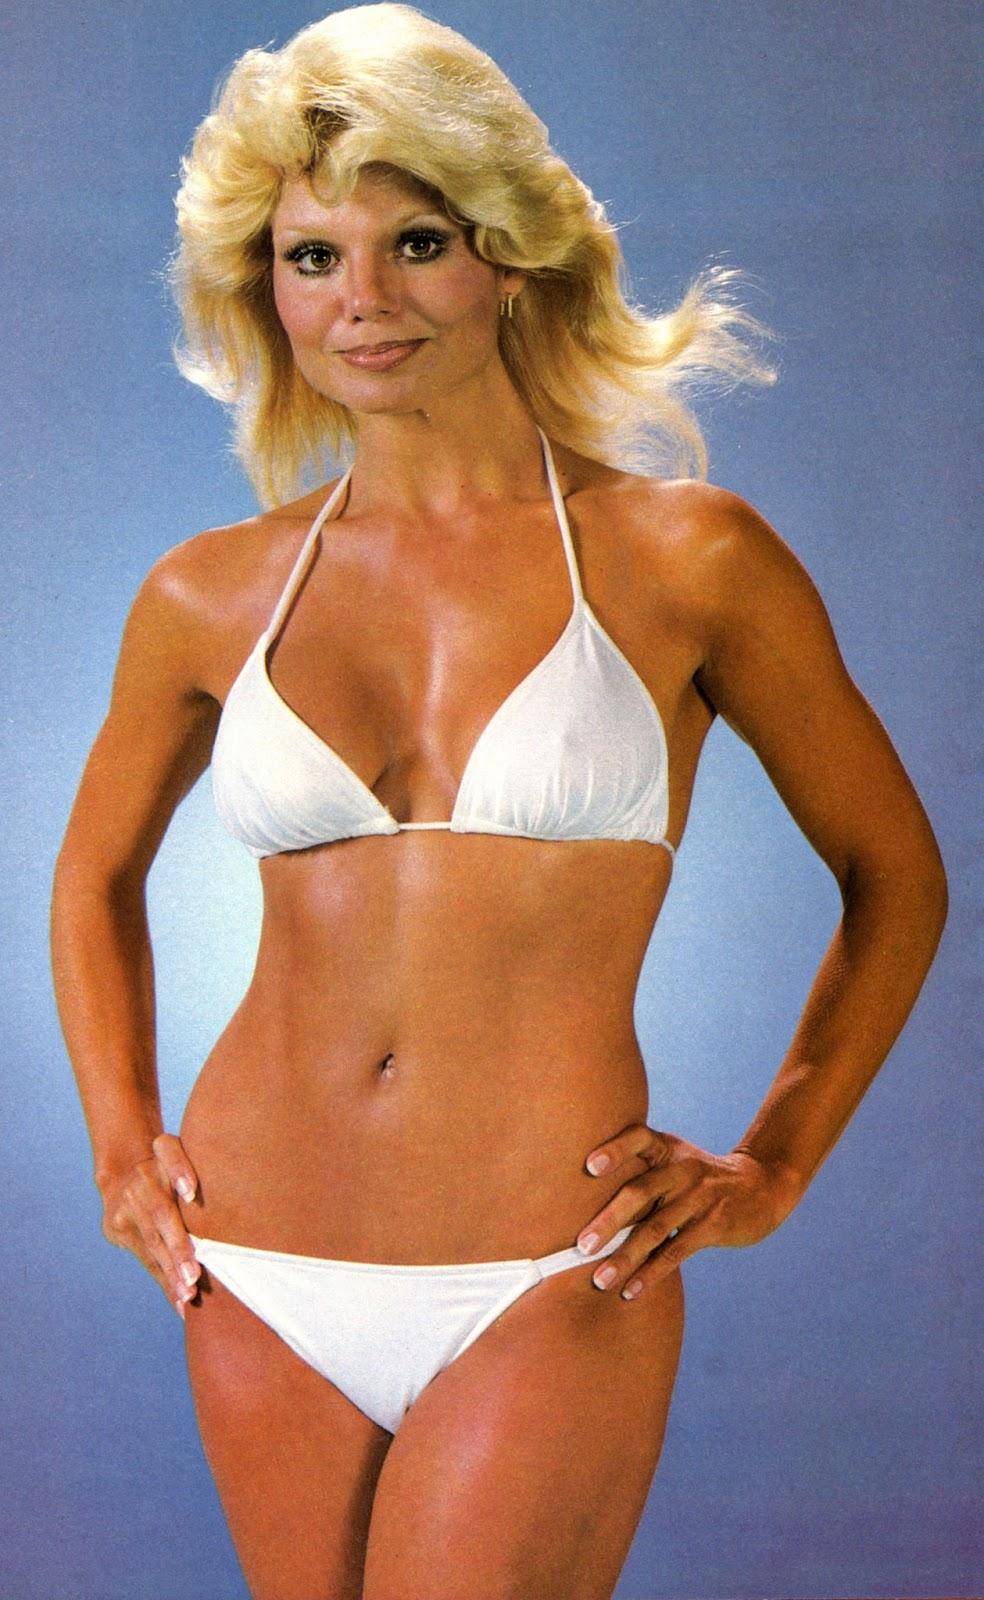 Bikini Tawny Kitaen nude (89 foto and video), Tits, Sideboobs, Boobs, braless 2015